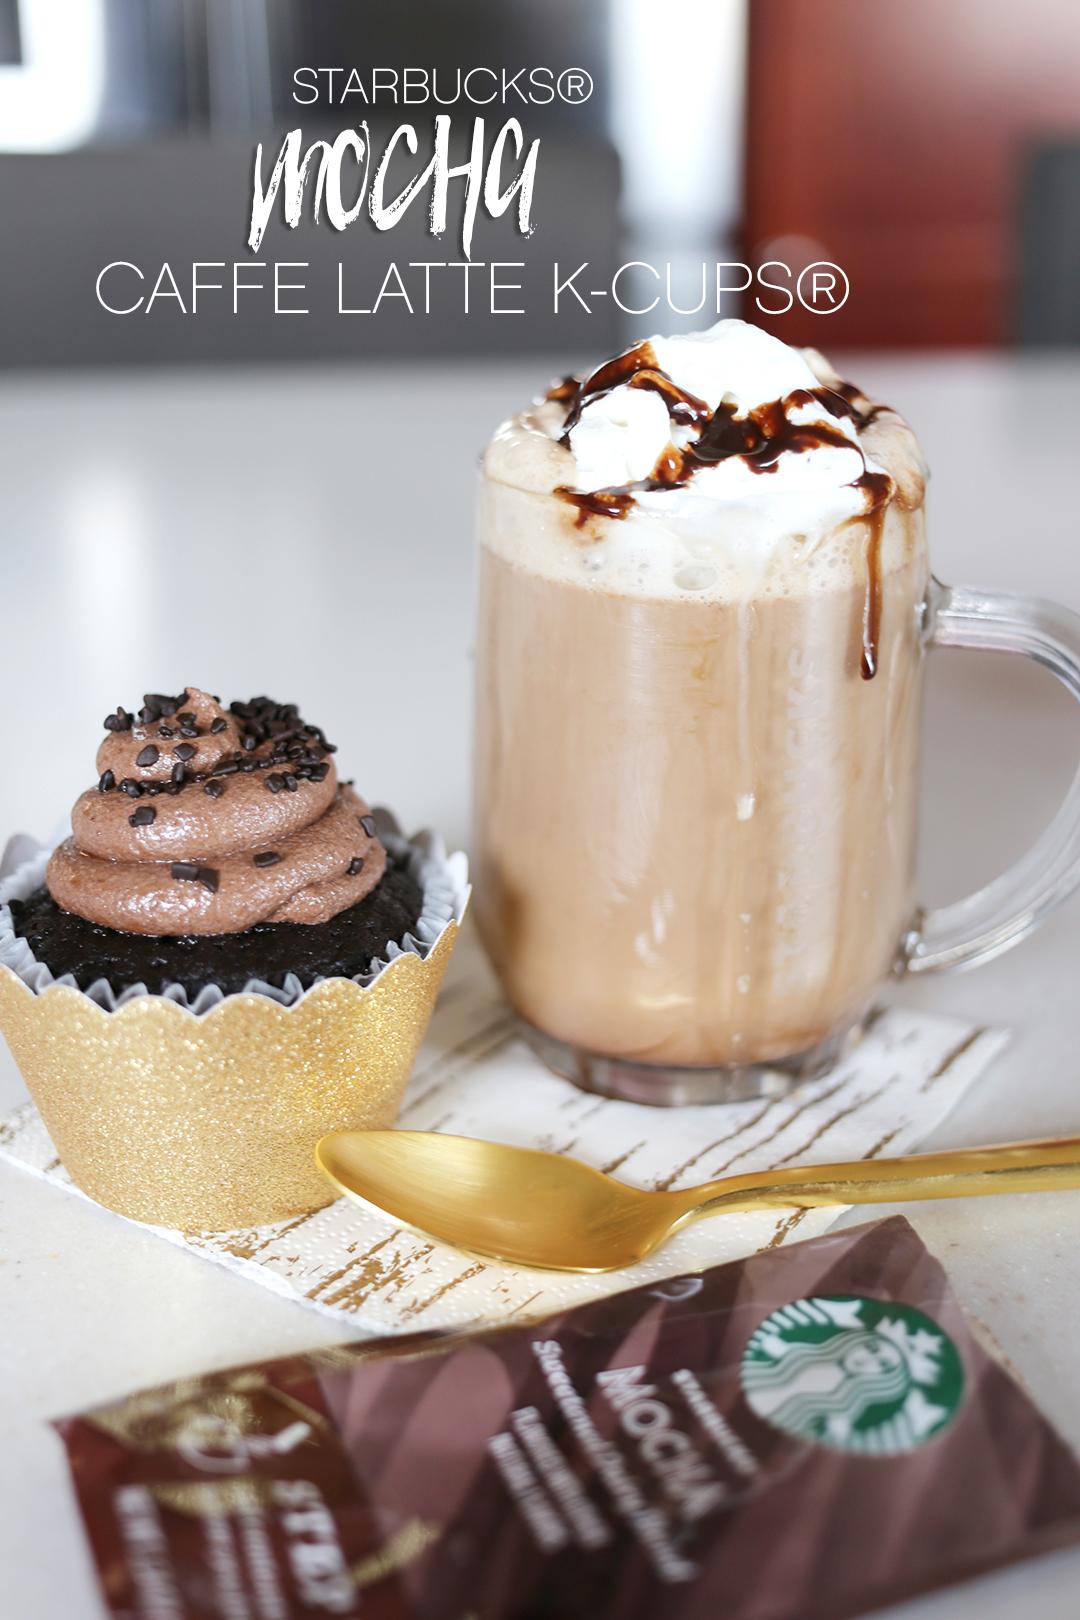 starbucks-mocha-caffe-latte-k-cups